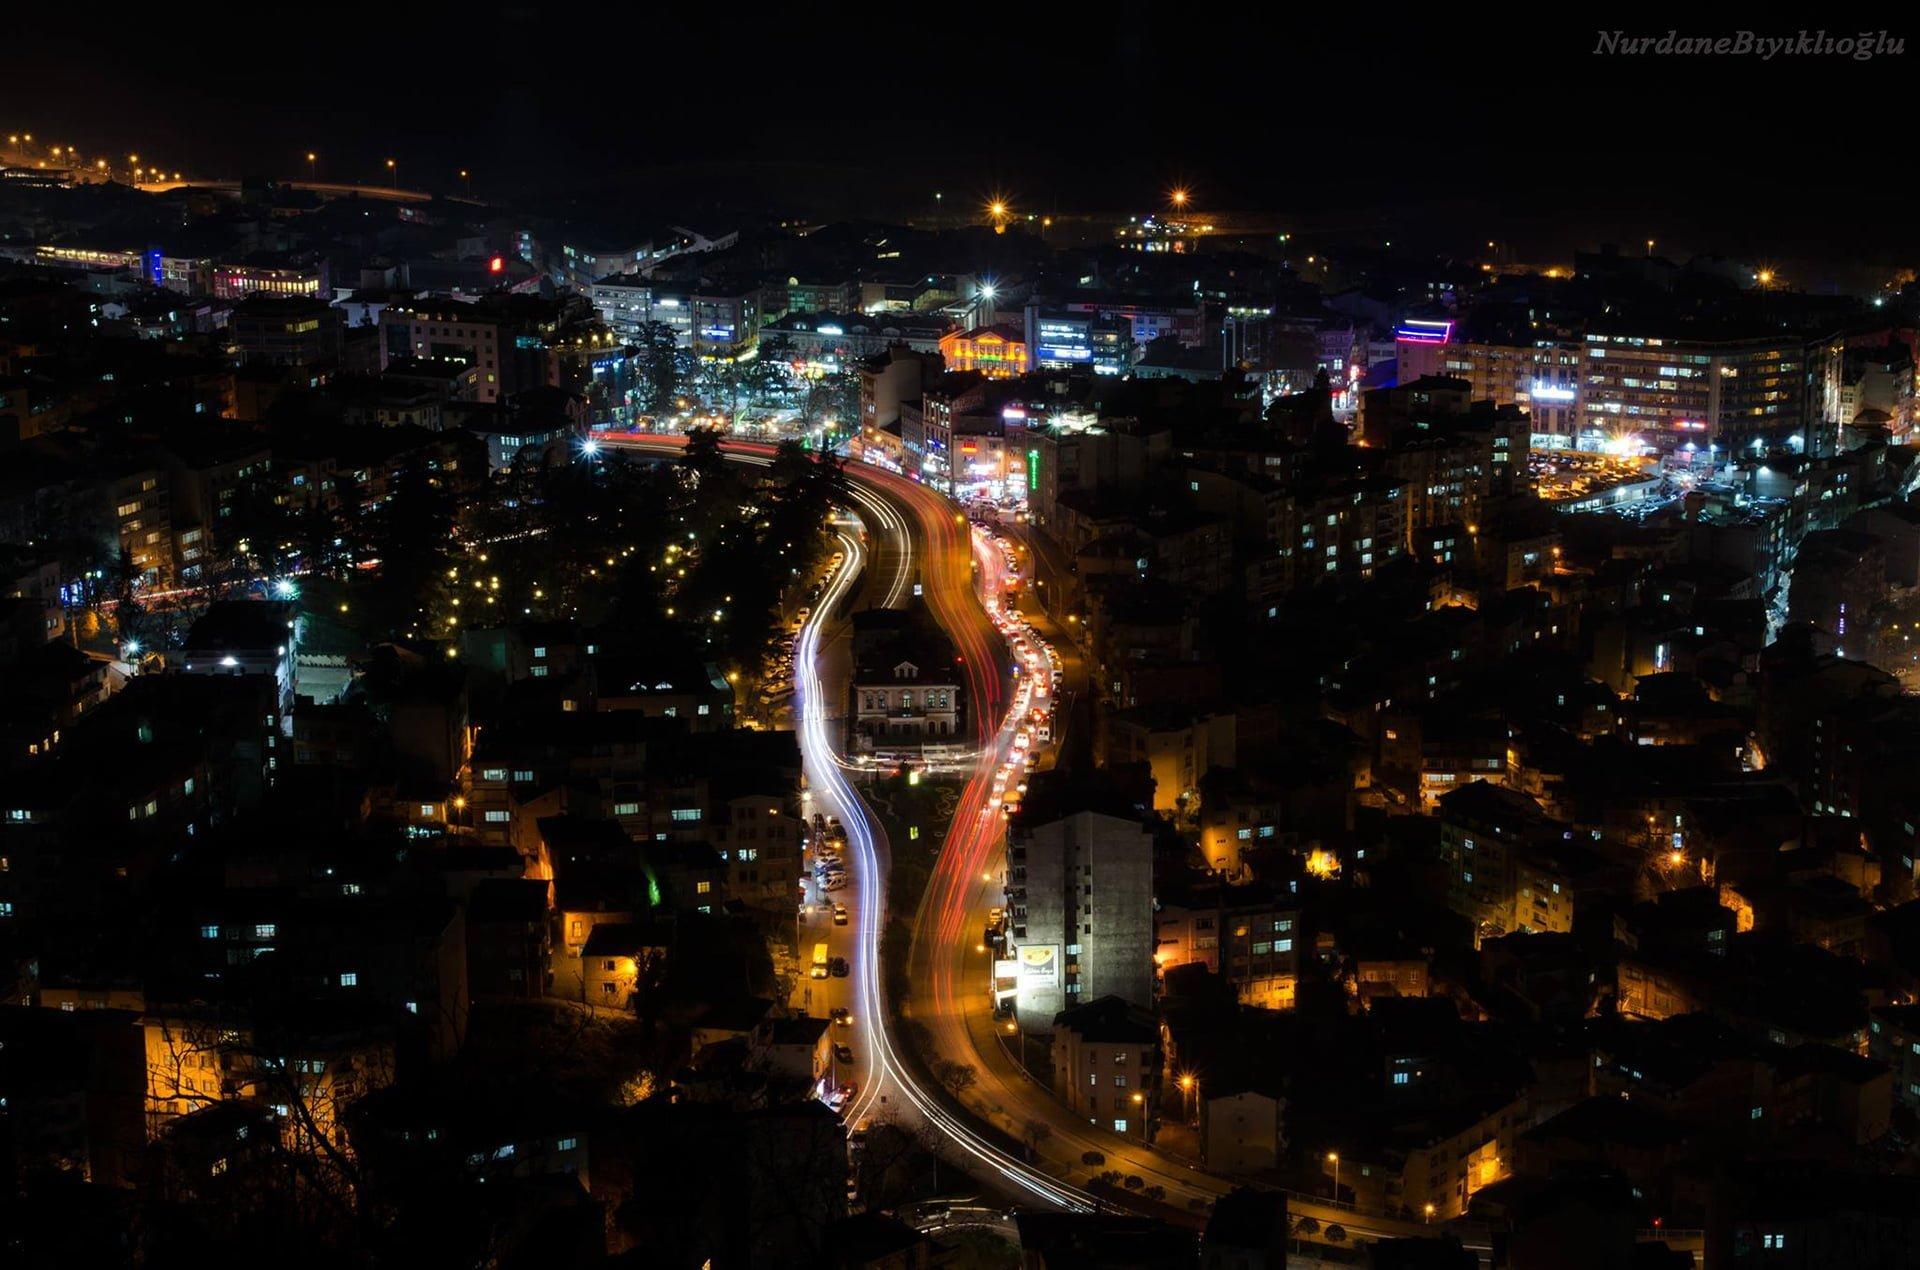 Trabzon uzun pozlama